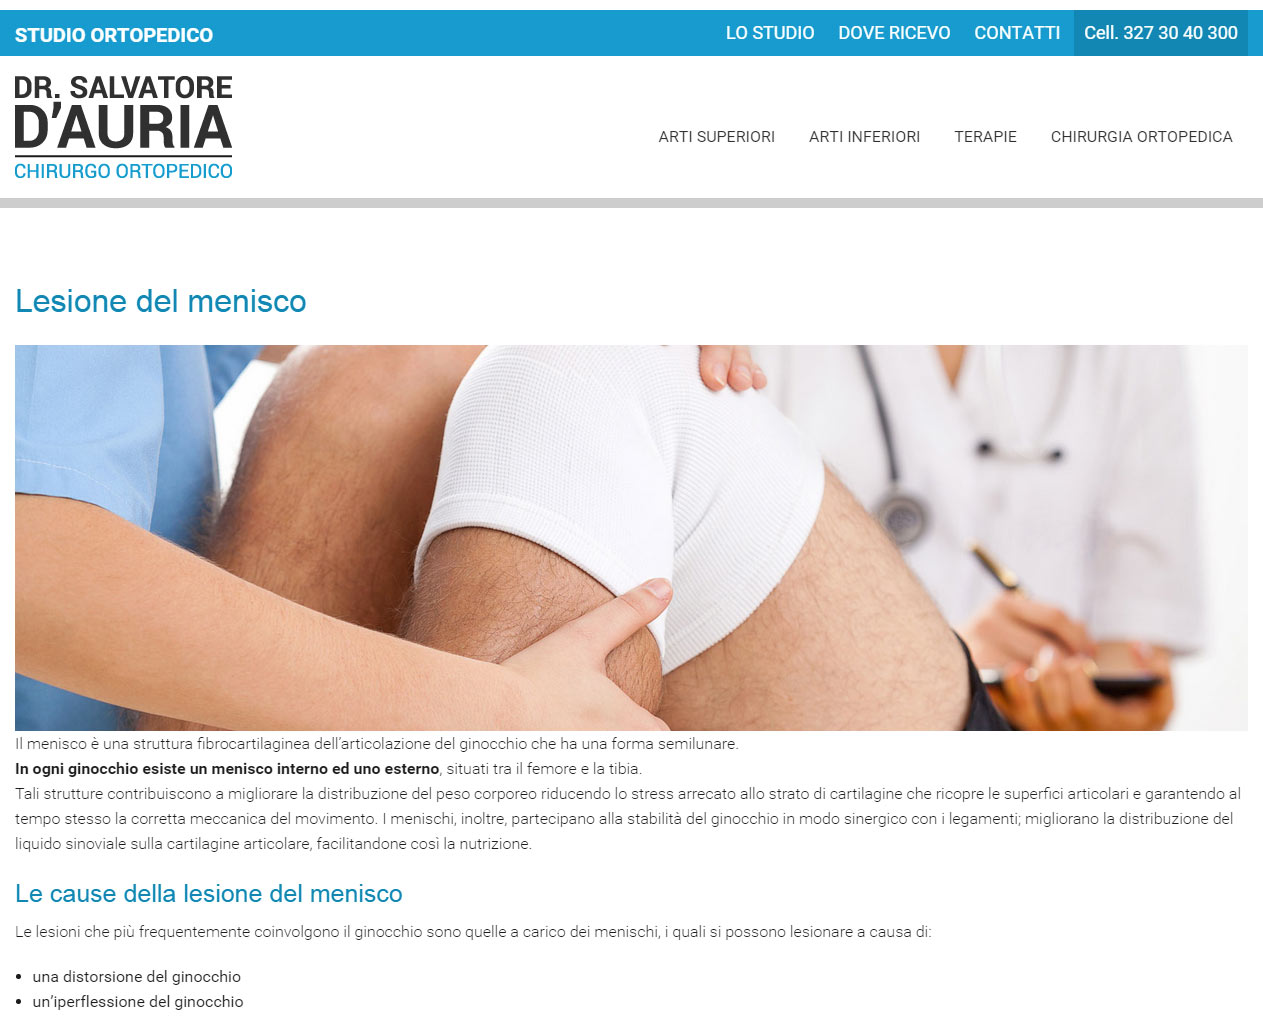 Studio Ortopedico Dr. D'Auria, catalogo online servizi medici